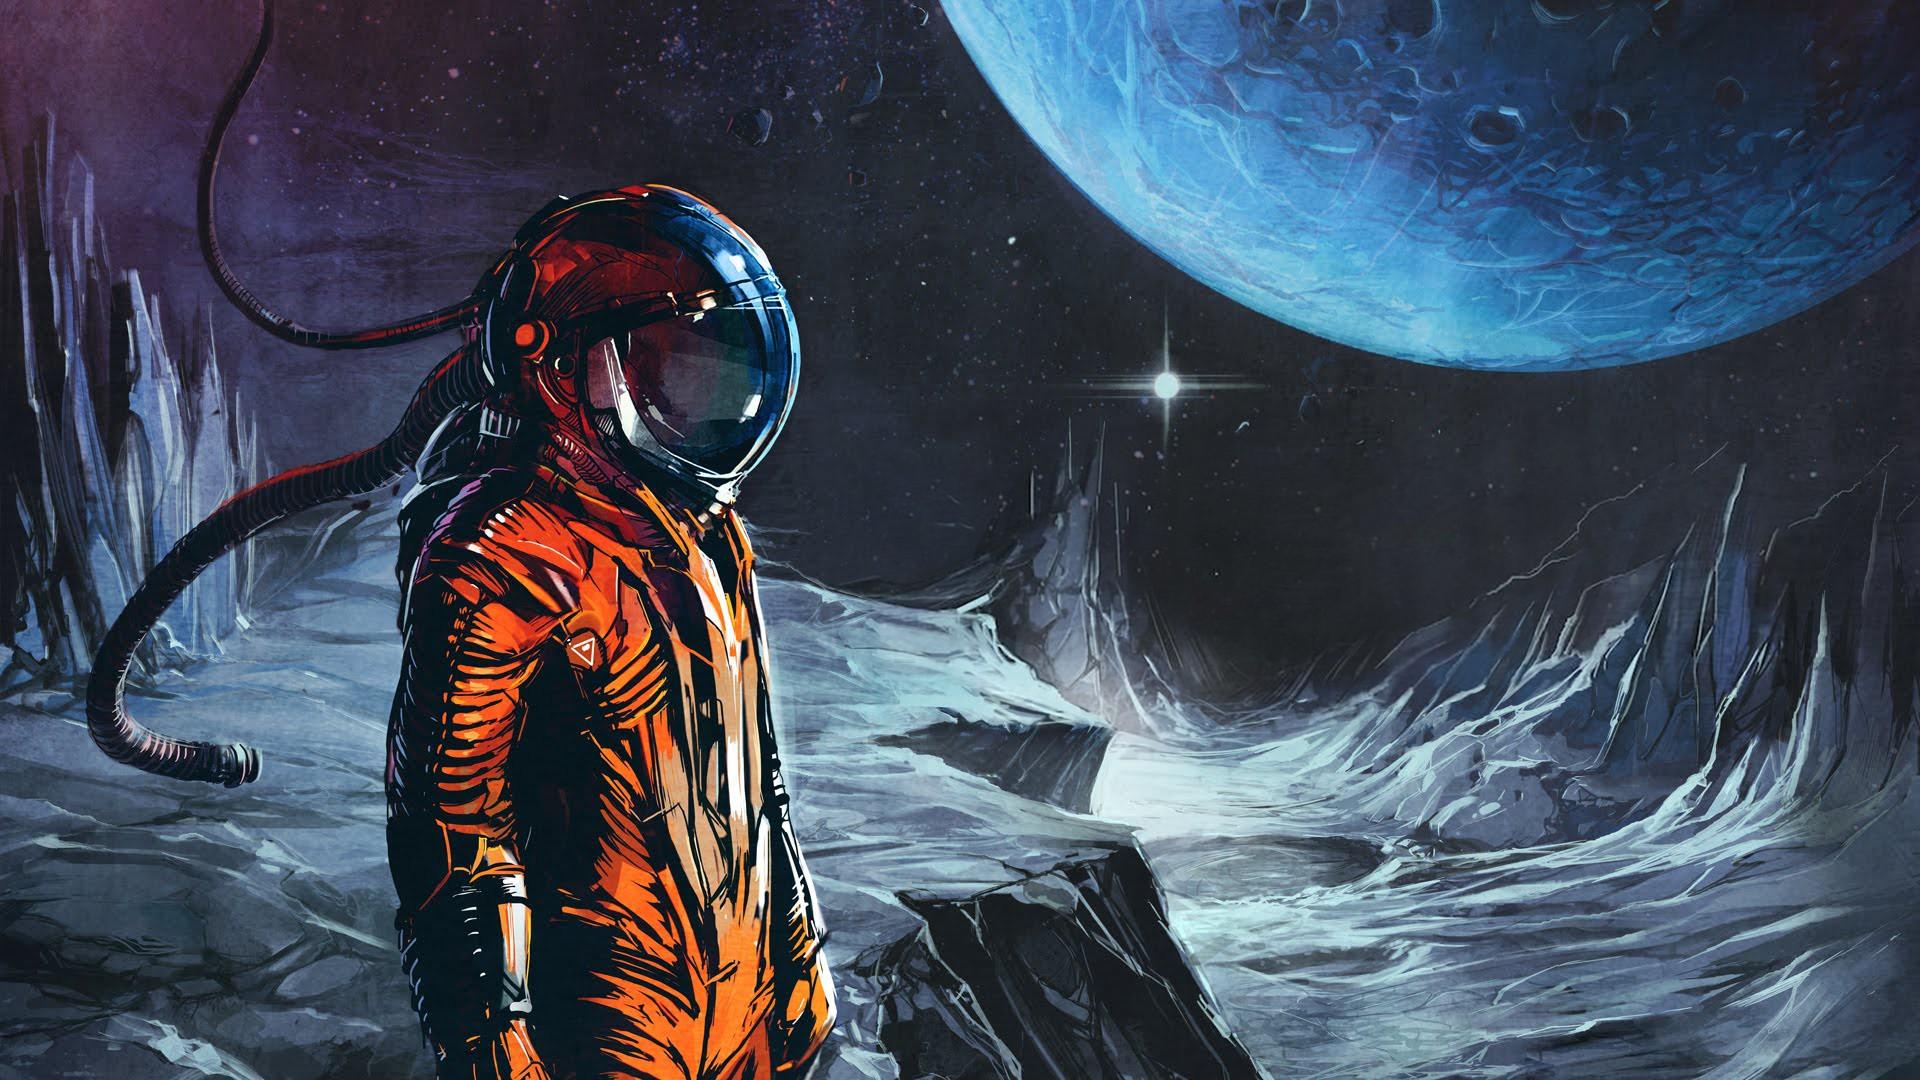 Обои скафандр, шлем, космонавт, astronaut. Игры foto 16